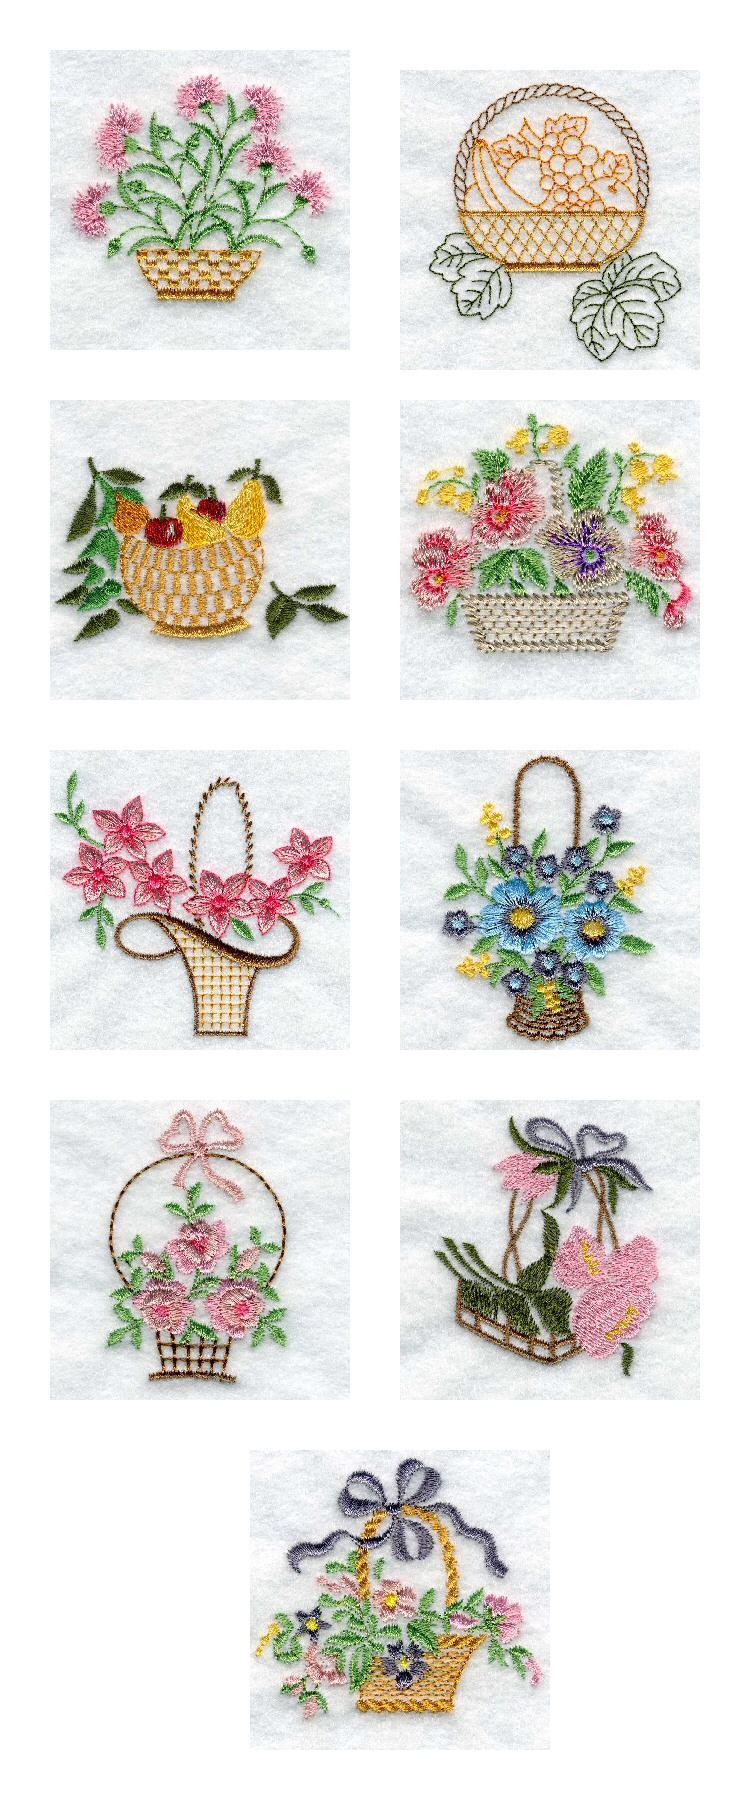 Embroidery machine designs floral baskets set